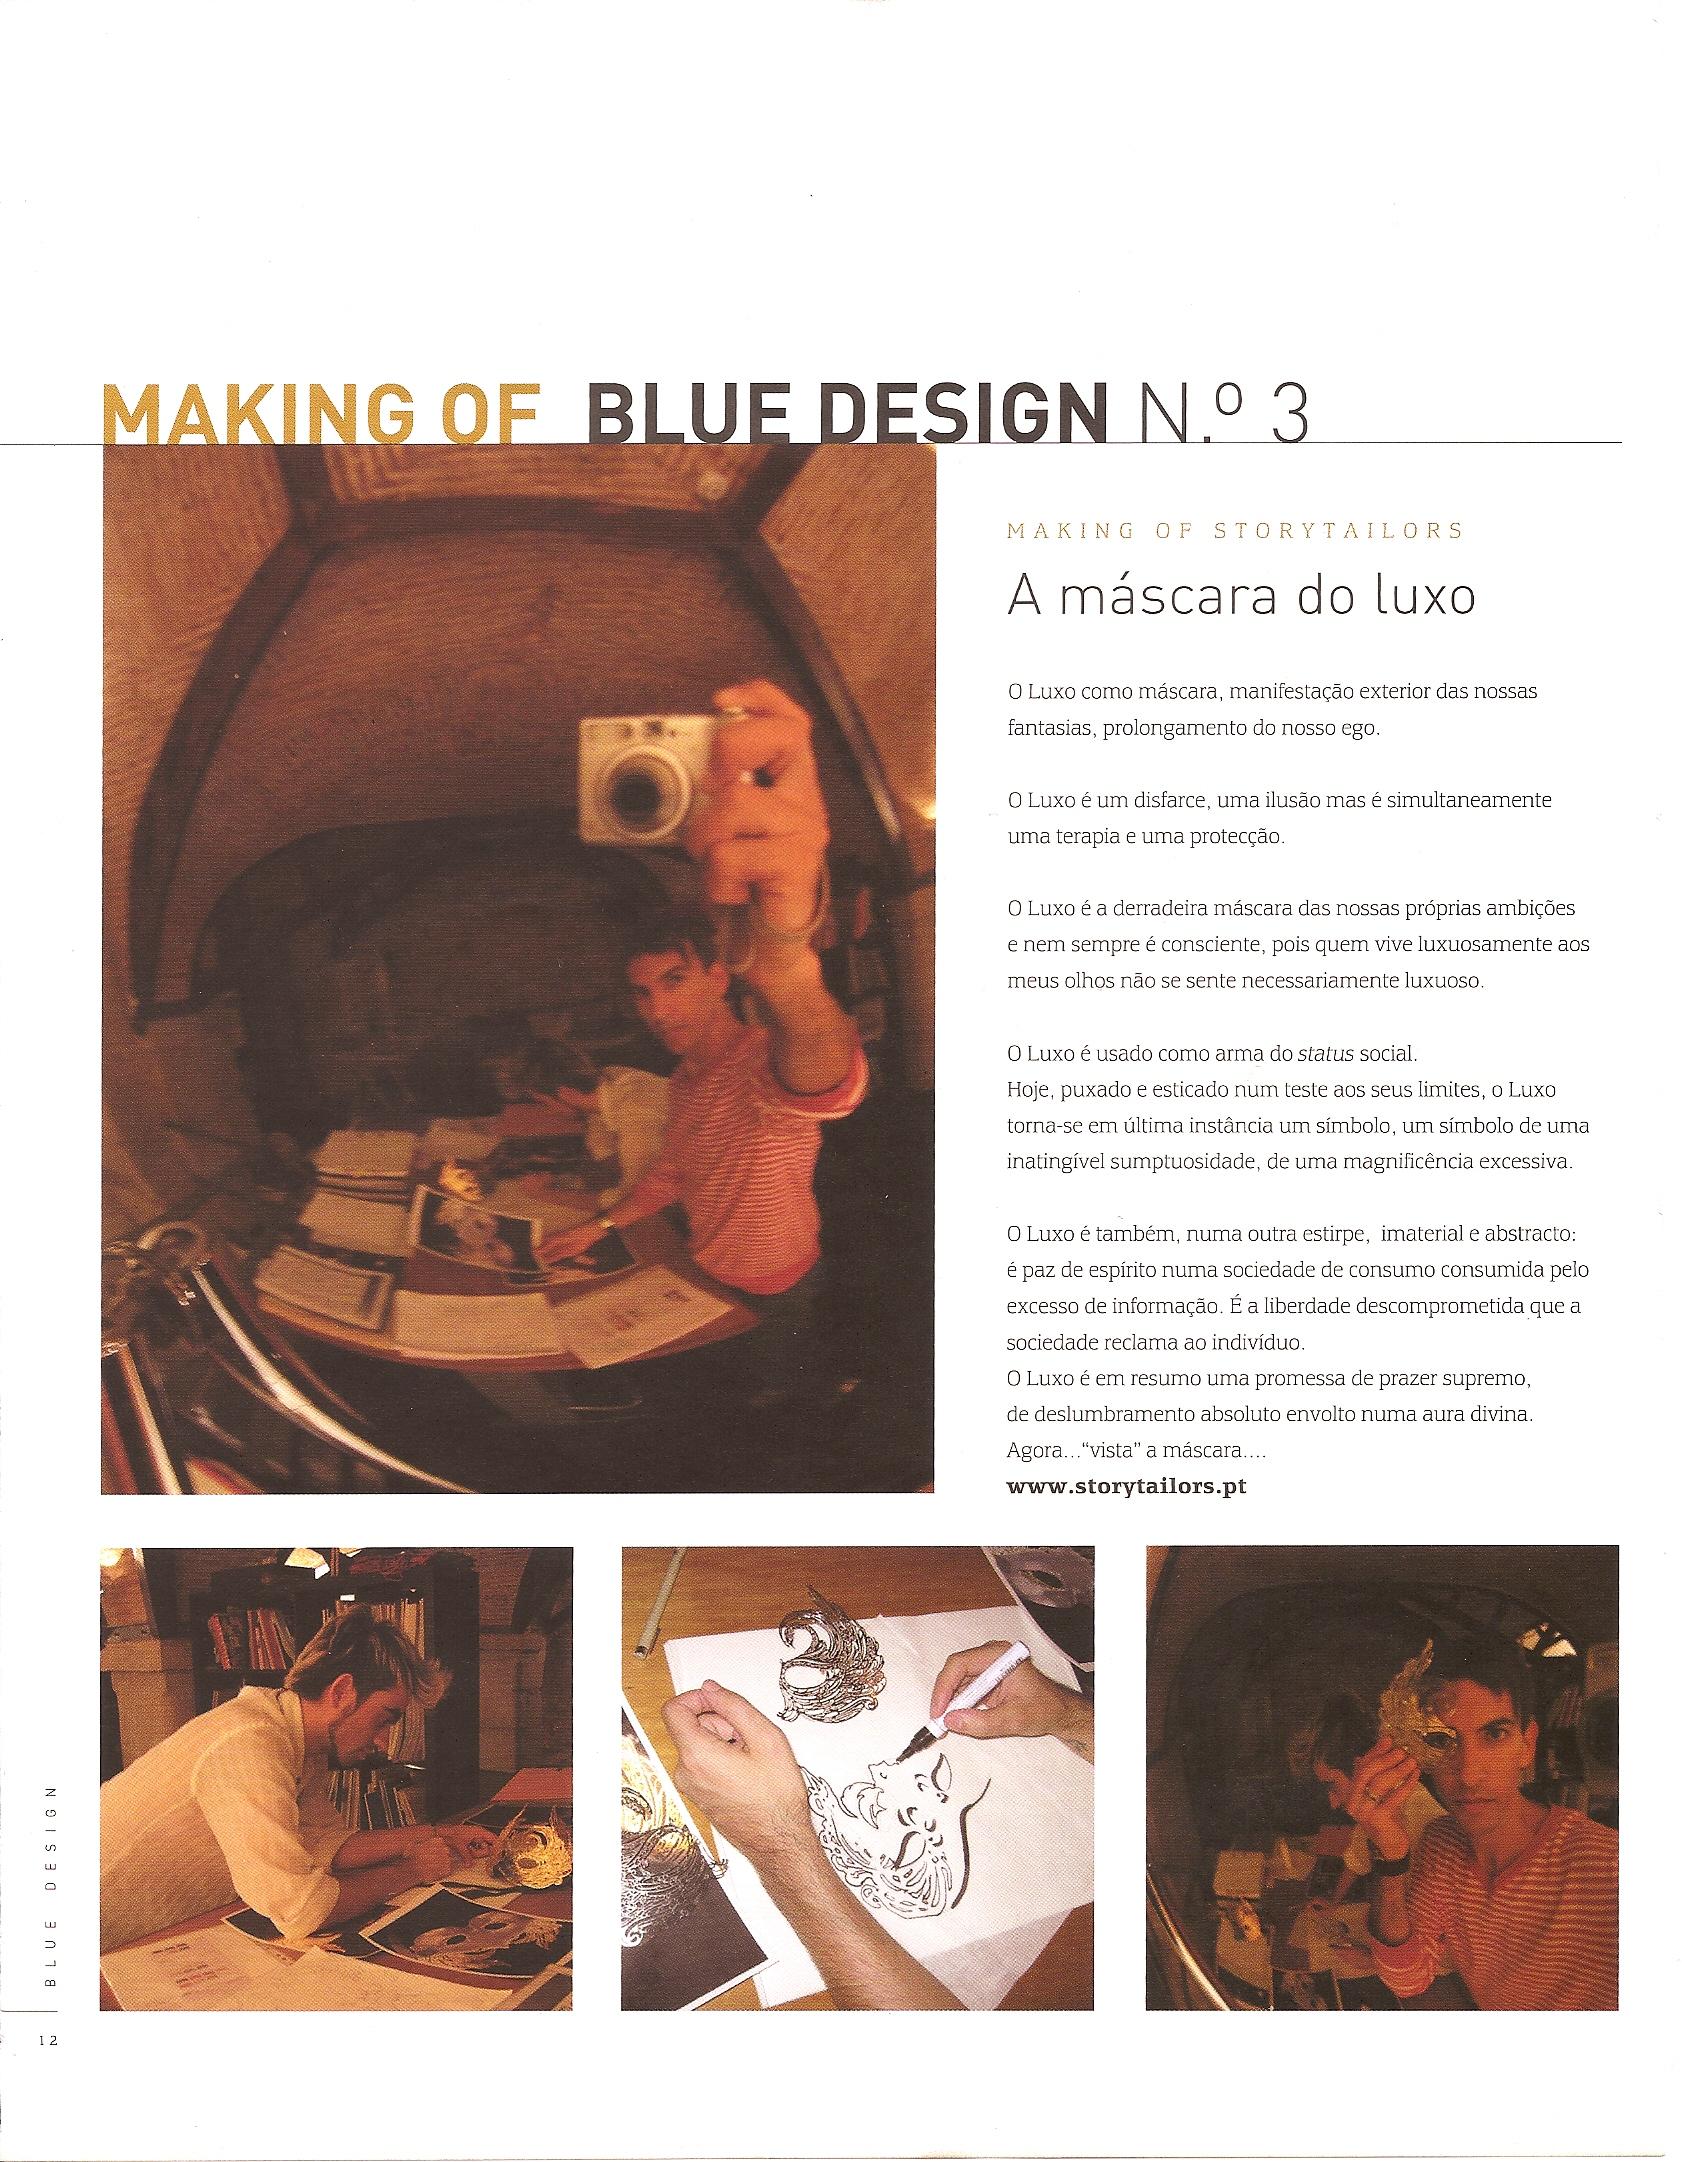 Blue-Desing-#3-pag1-2007